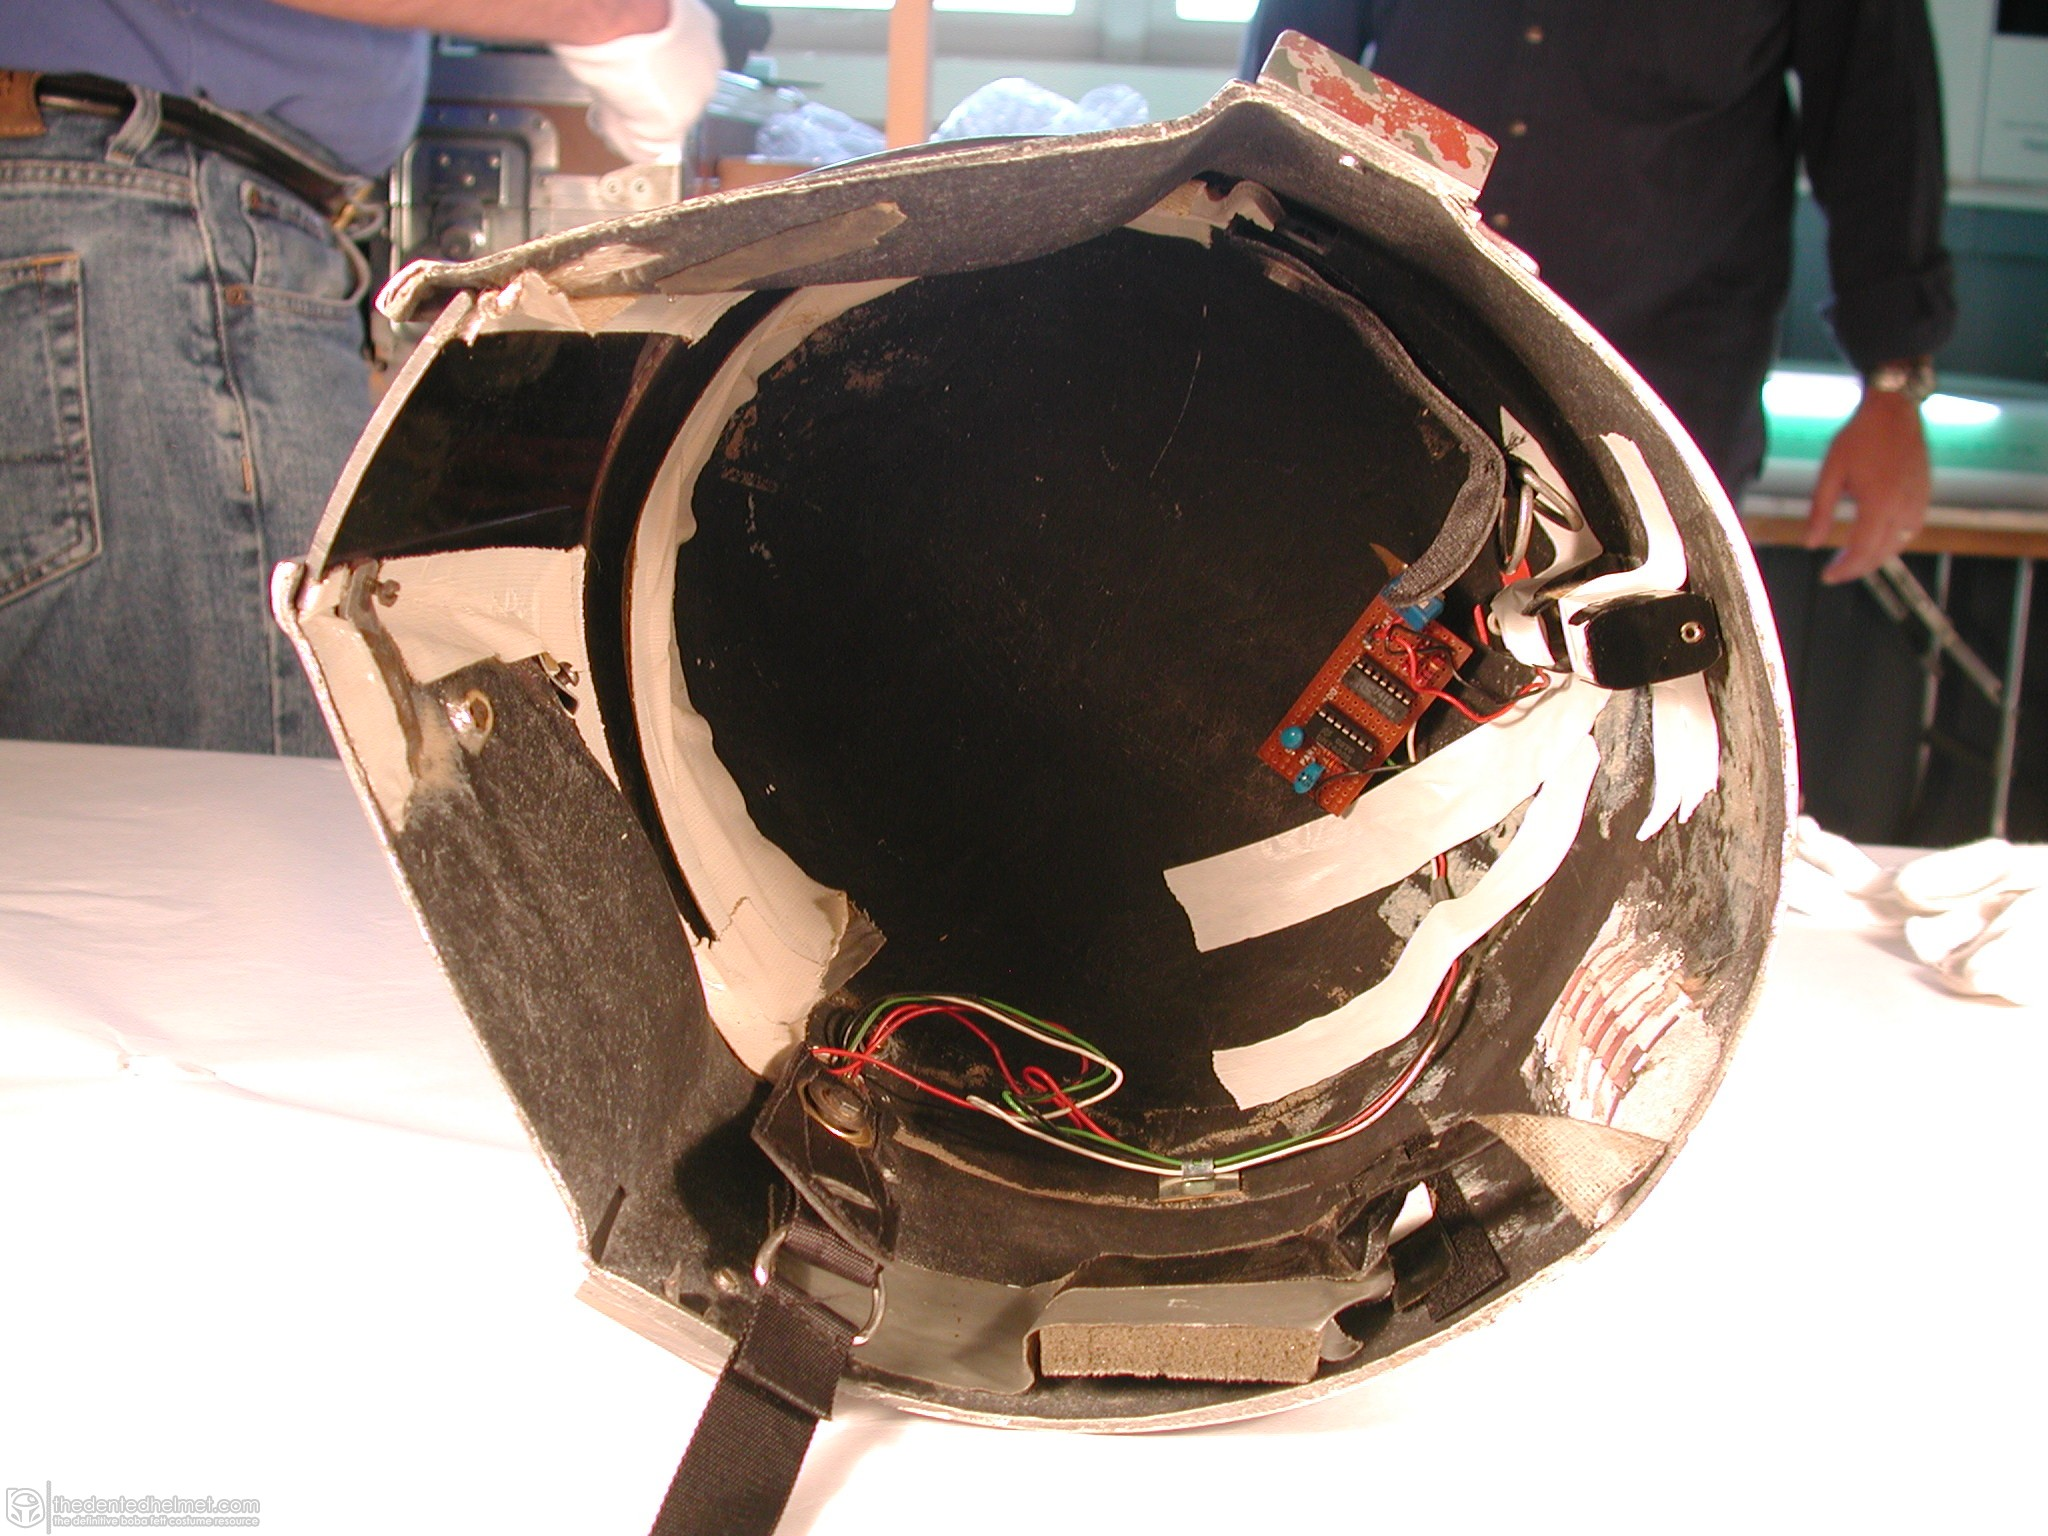 Boba-Fett-Third-Prototype-Helmet-003.jpg